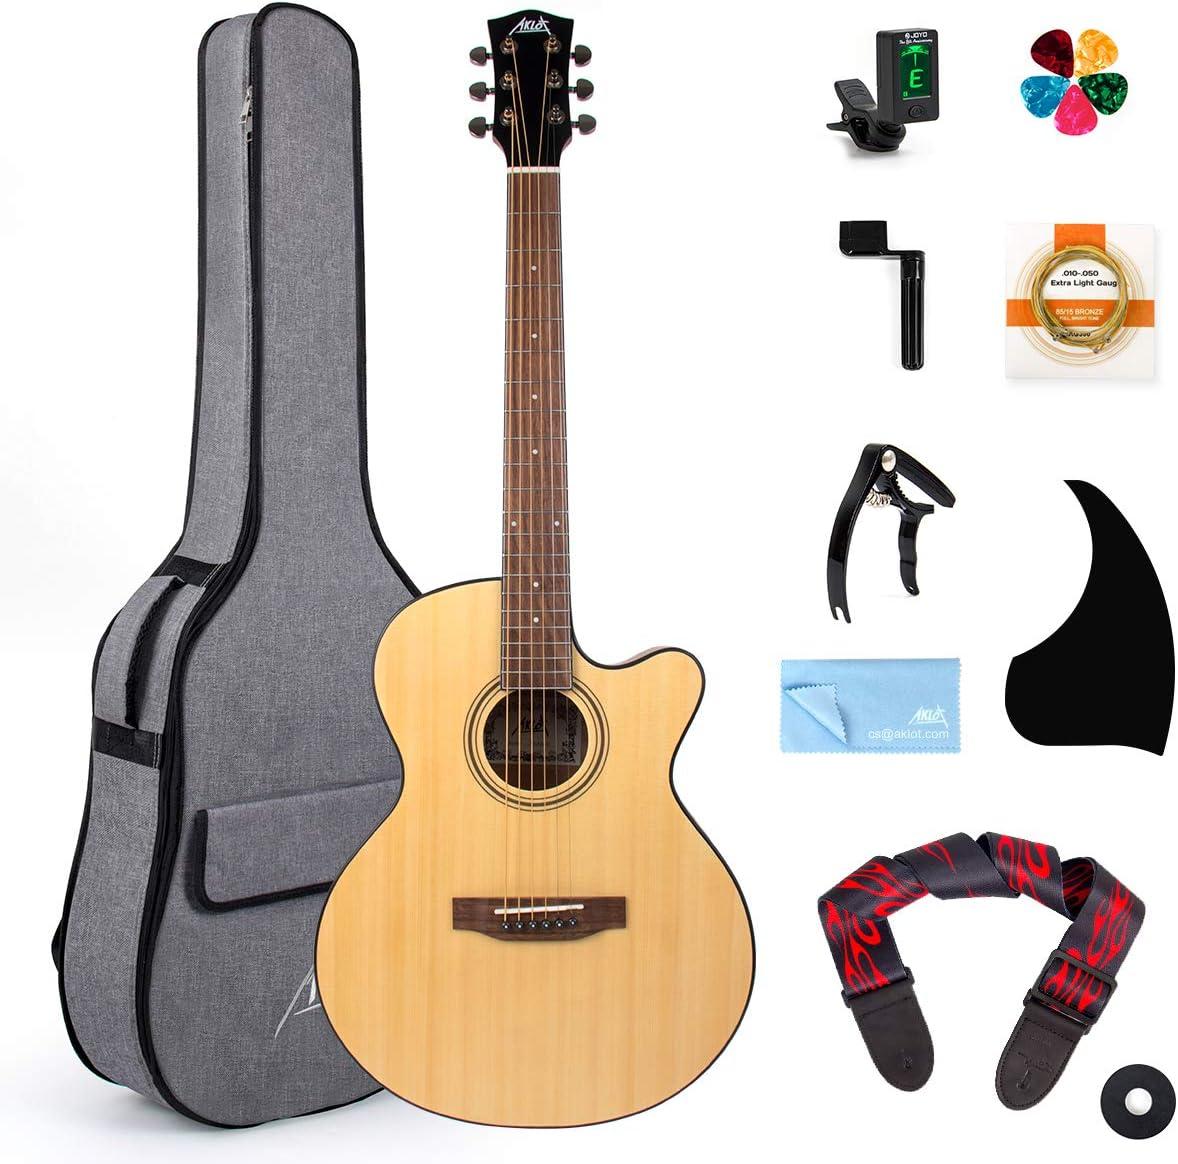 AKLOT Guitarra acústica 38 pulgadas Spruce Cutaway Guitar Bundle para estudiantes Niños principiantes W/Gig Bag Tuner Strap Picks Cuerdas Pickguard Guitar Capo String Winder